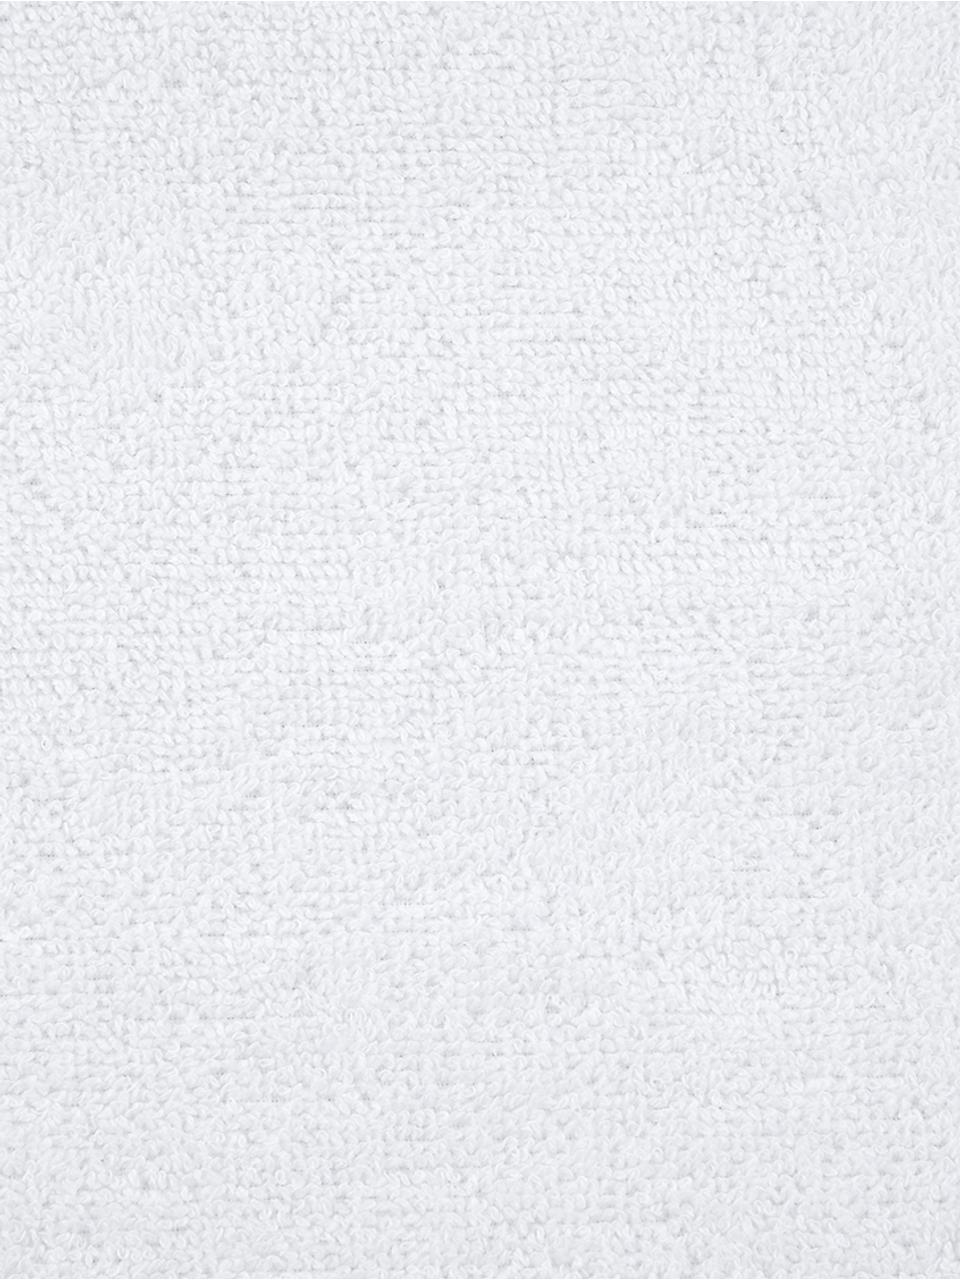 Asciugamano in tinta unita Comfort, Bianco, Asciugamano per ospiti